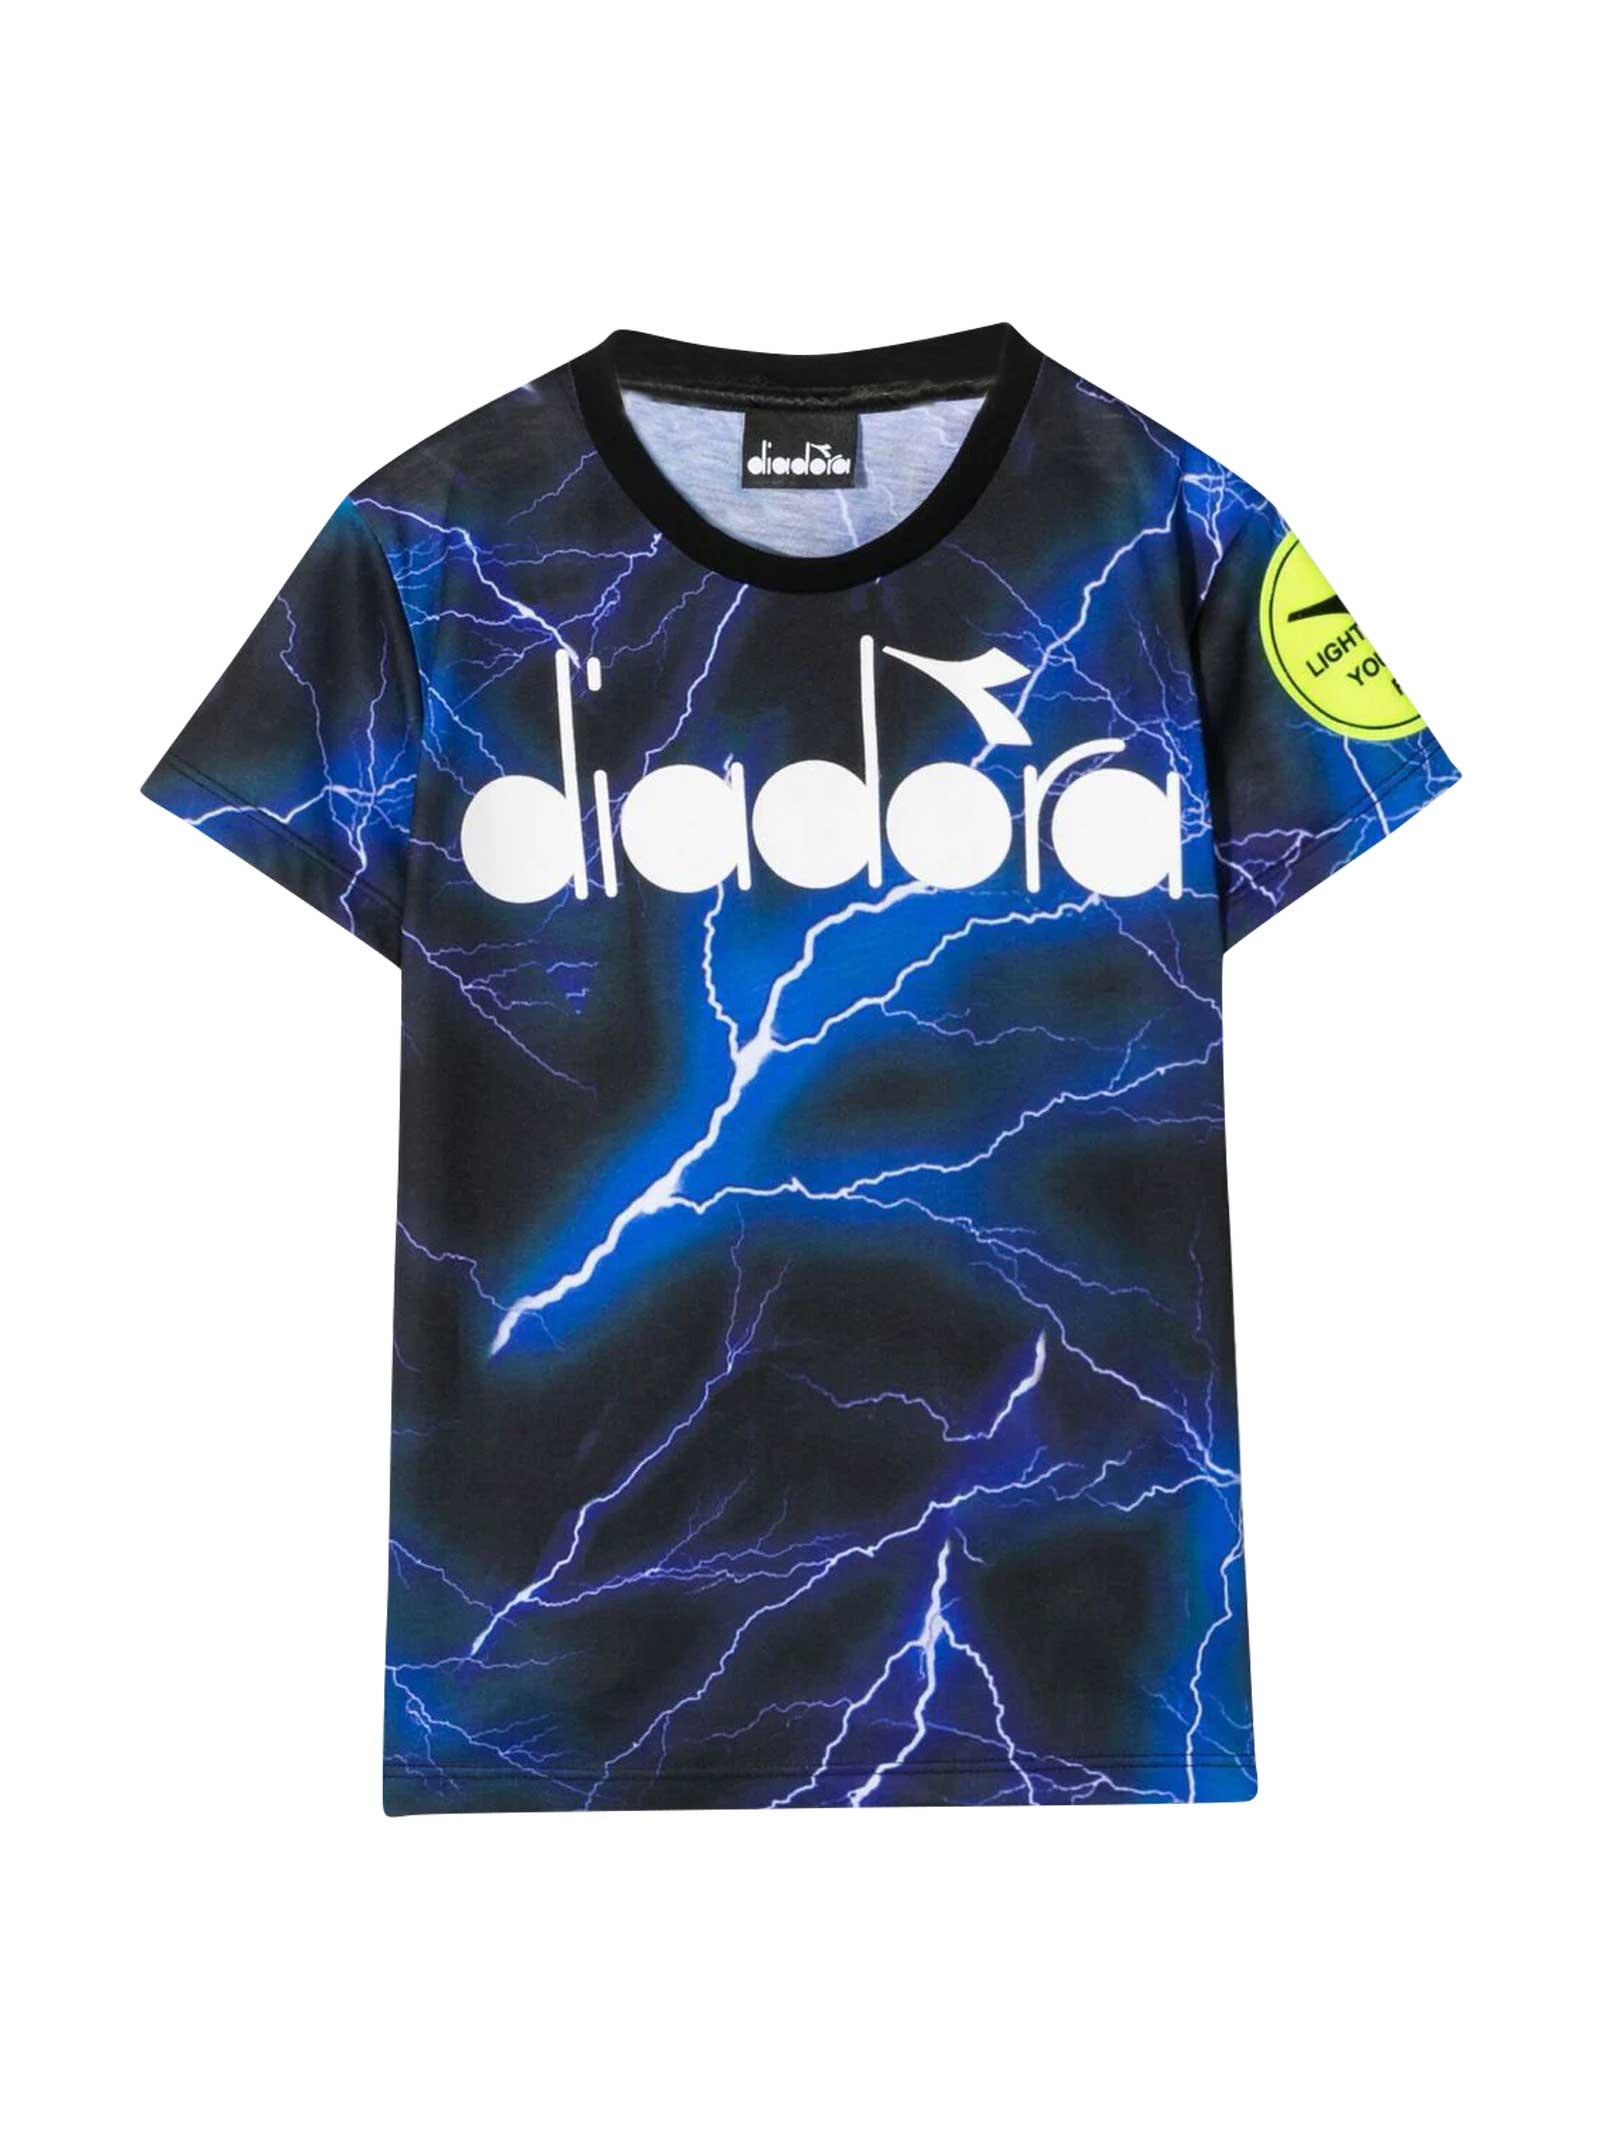 Diadora Diadora Kids Blue T-shirt